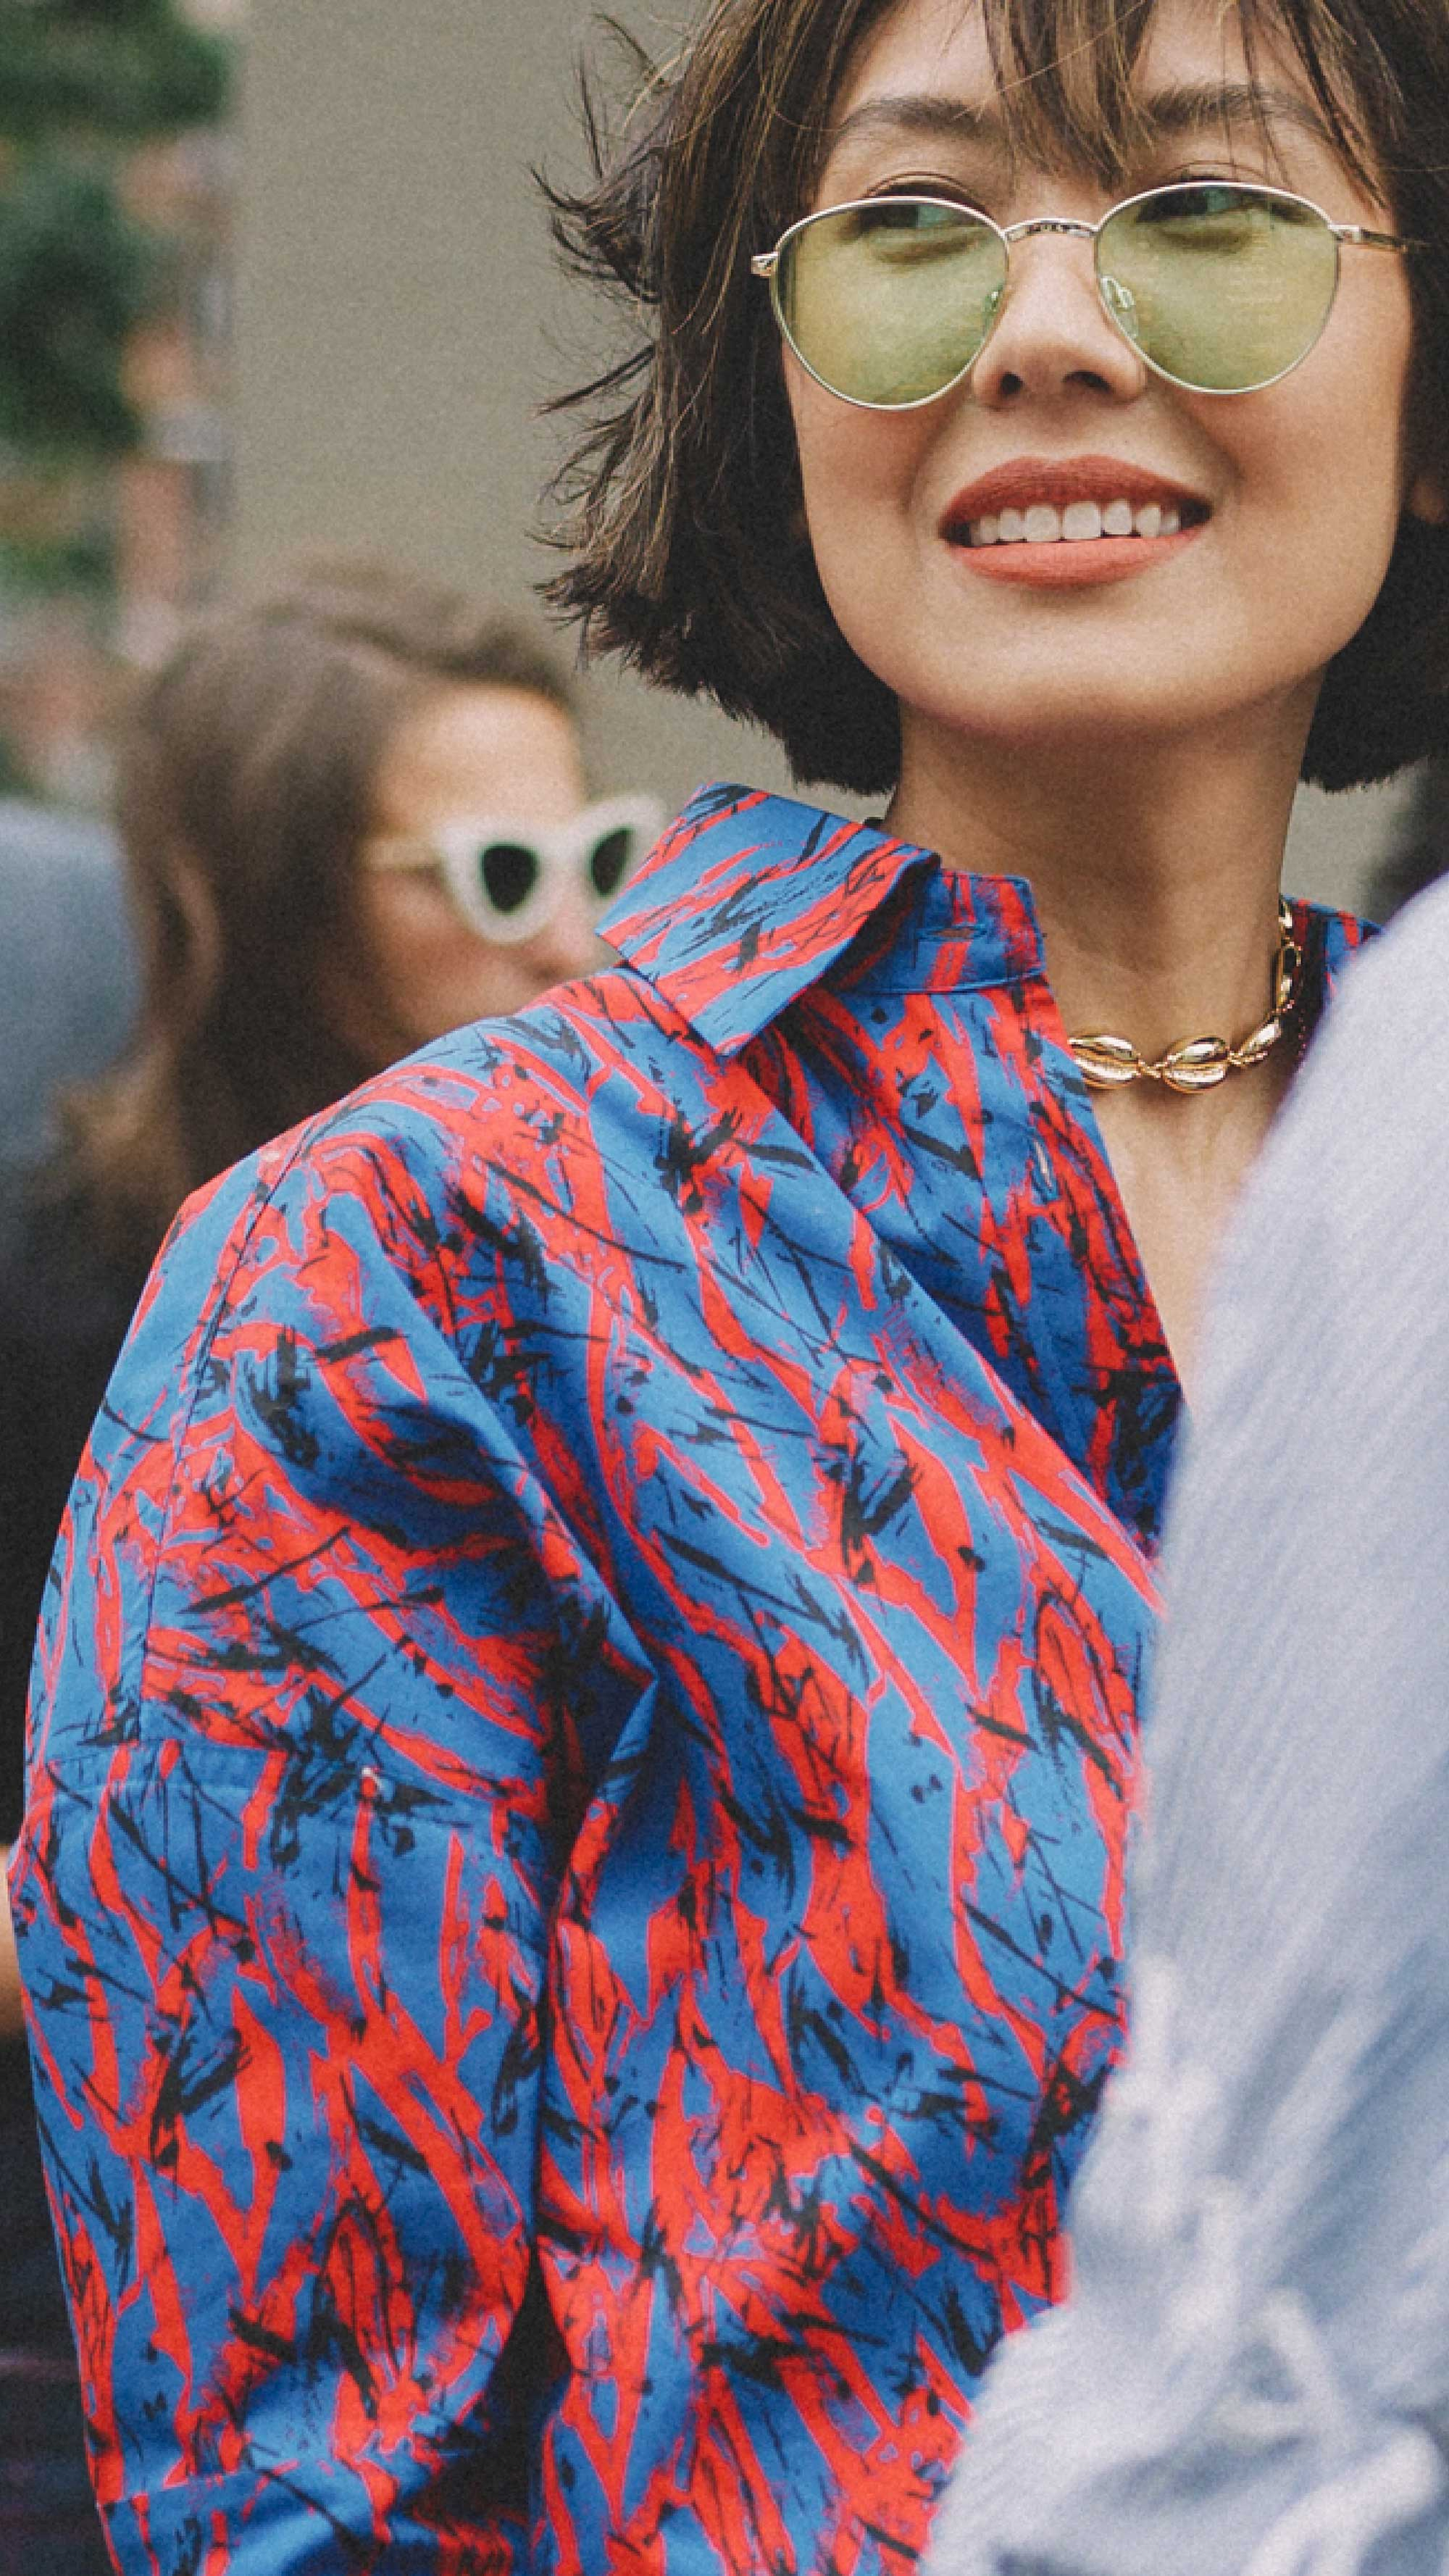 New-York-Fashion-Week-NYFW-SS18-street-style-day-three-SS1810.jpg